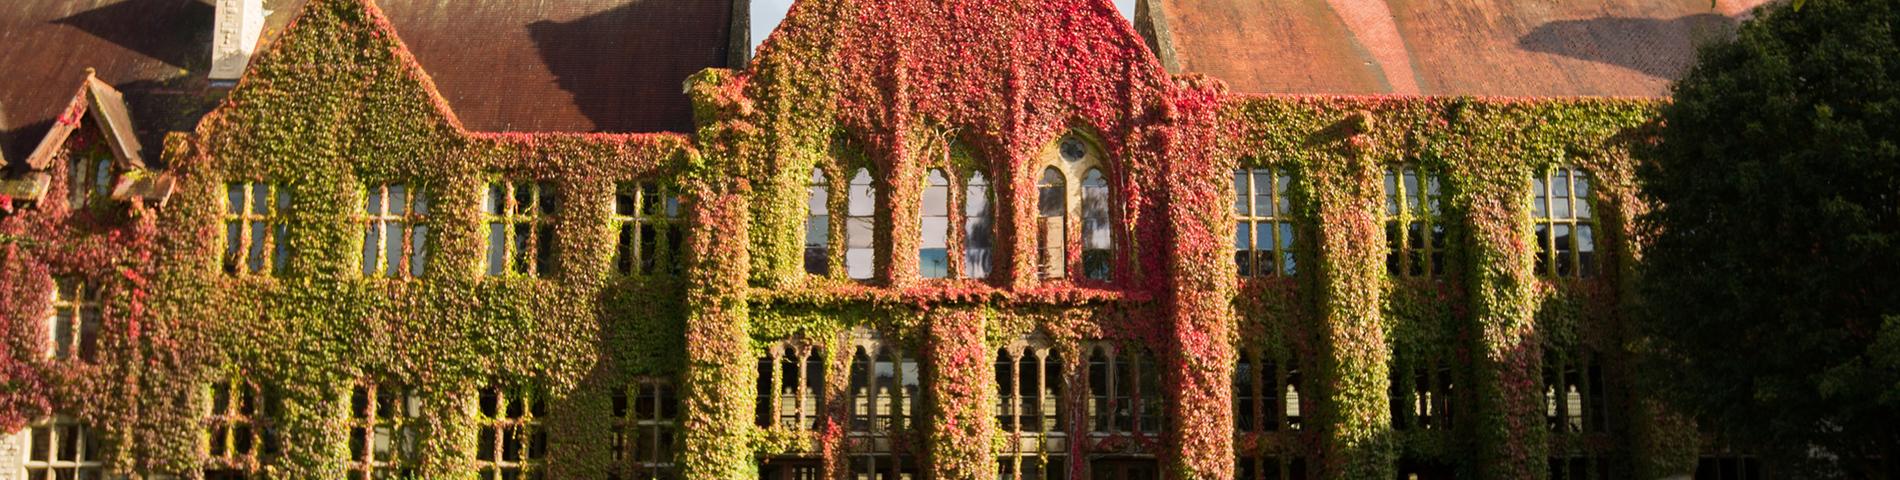 Oxford Spires Junior Centre afbeelding 1